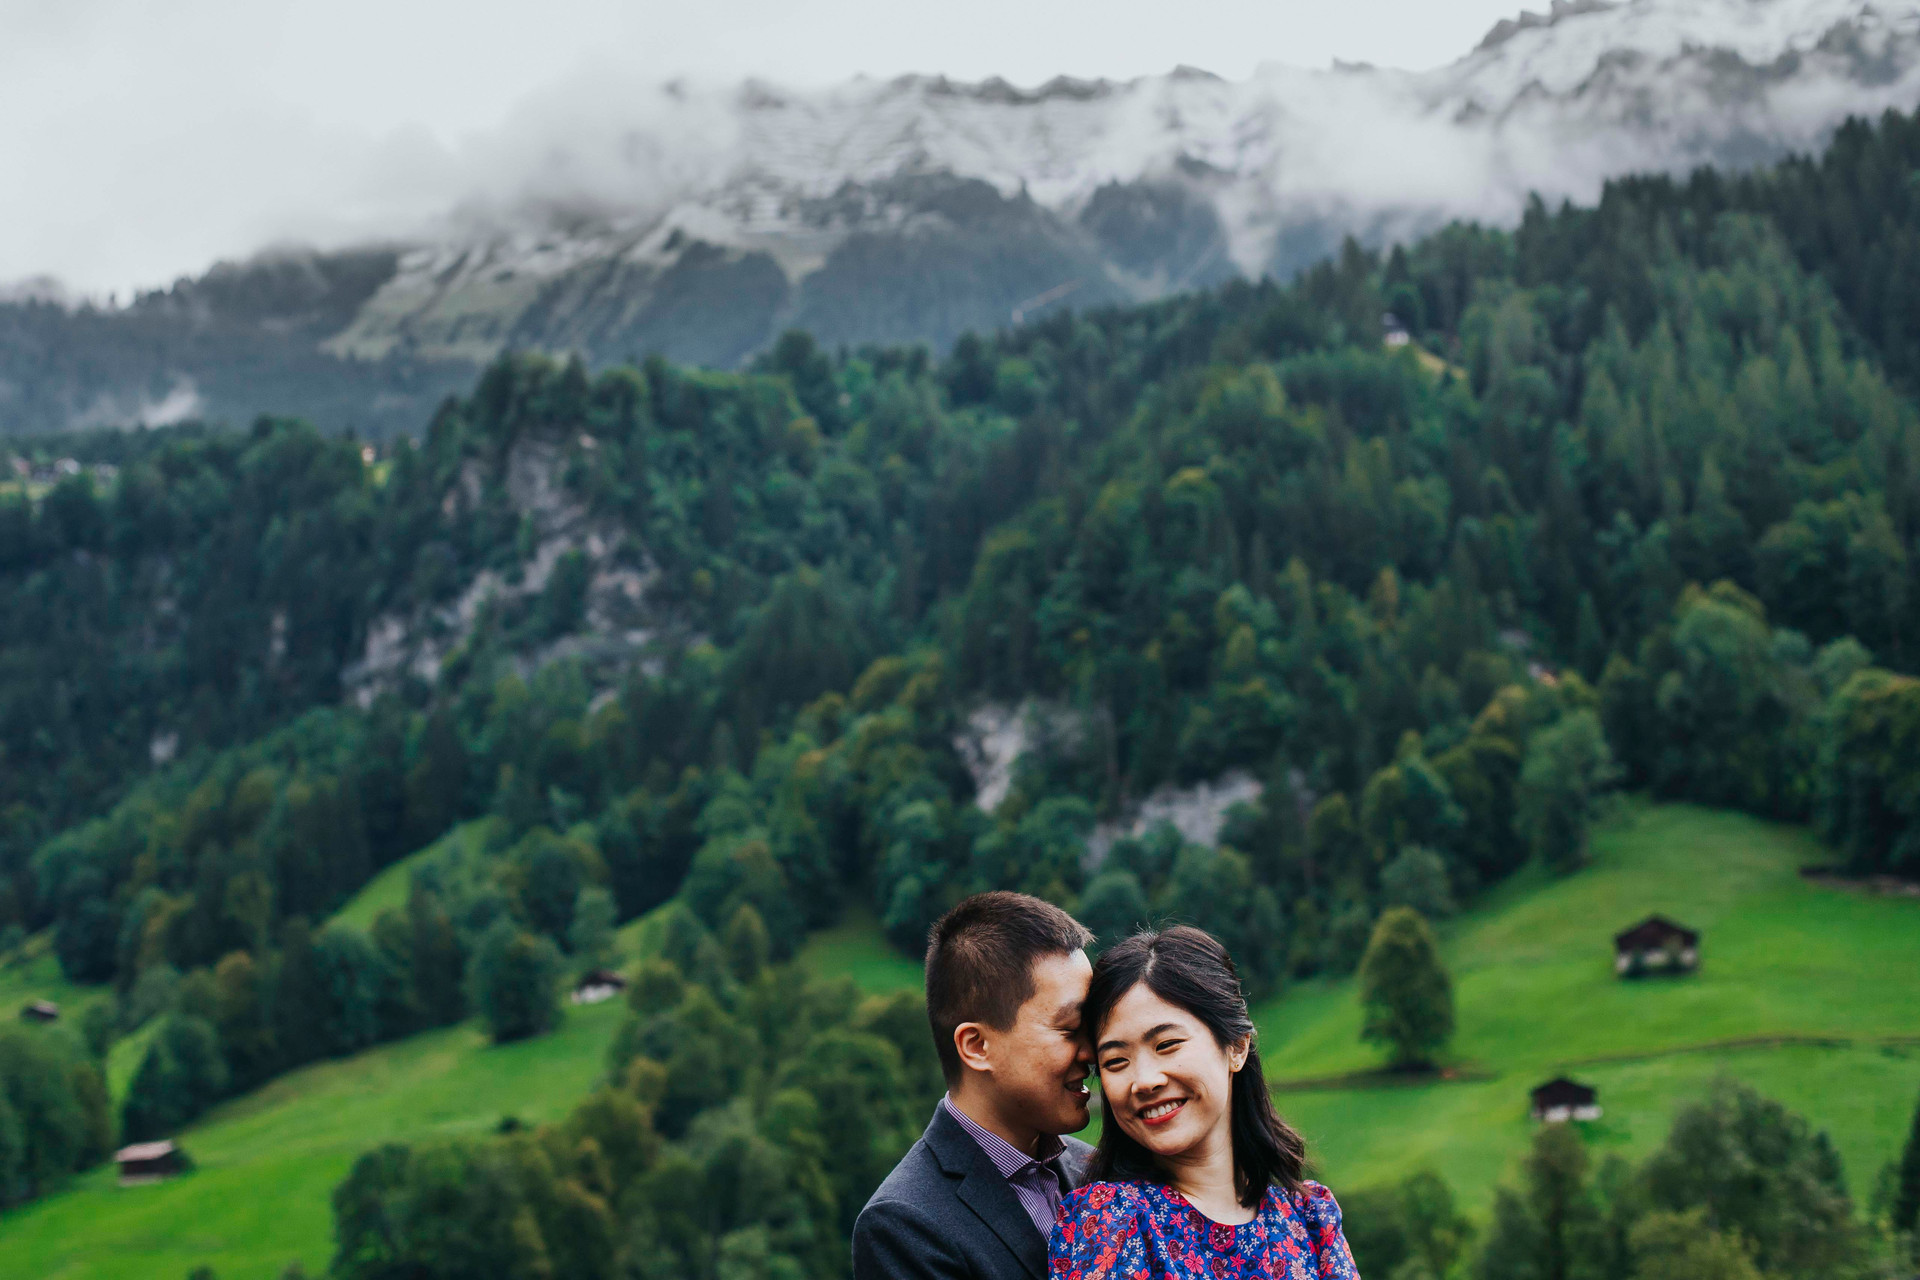 Lauterbrunnen photo session-3.jpg